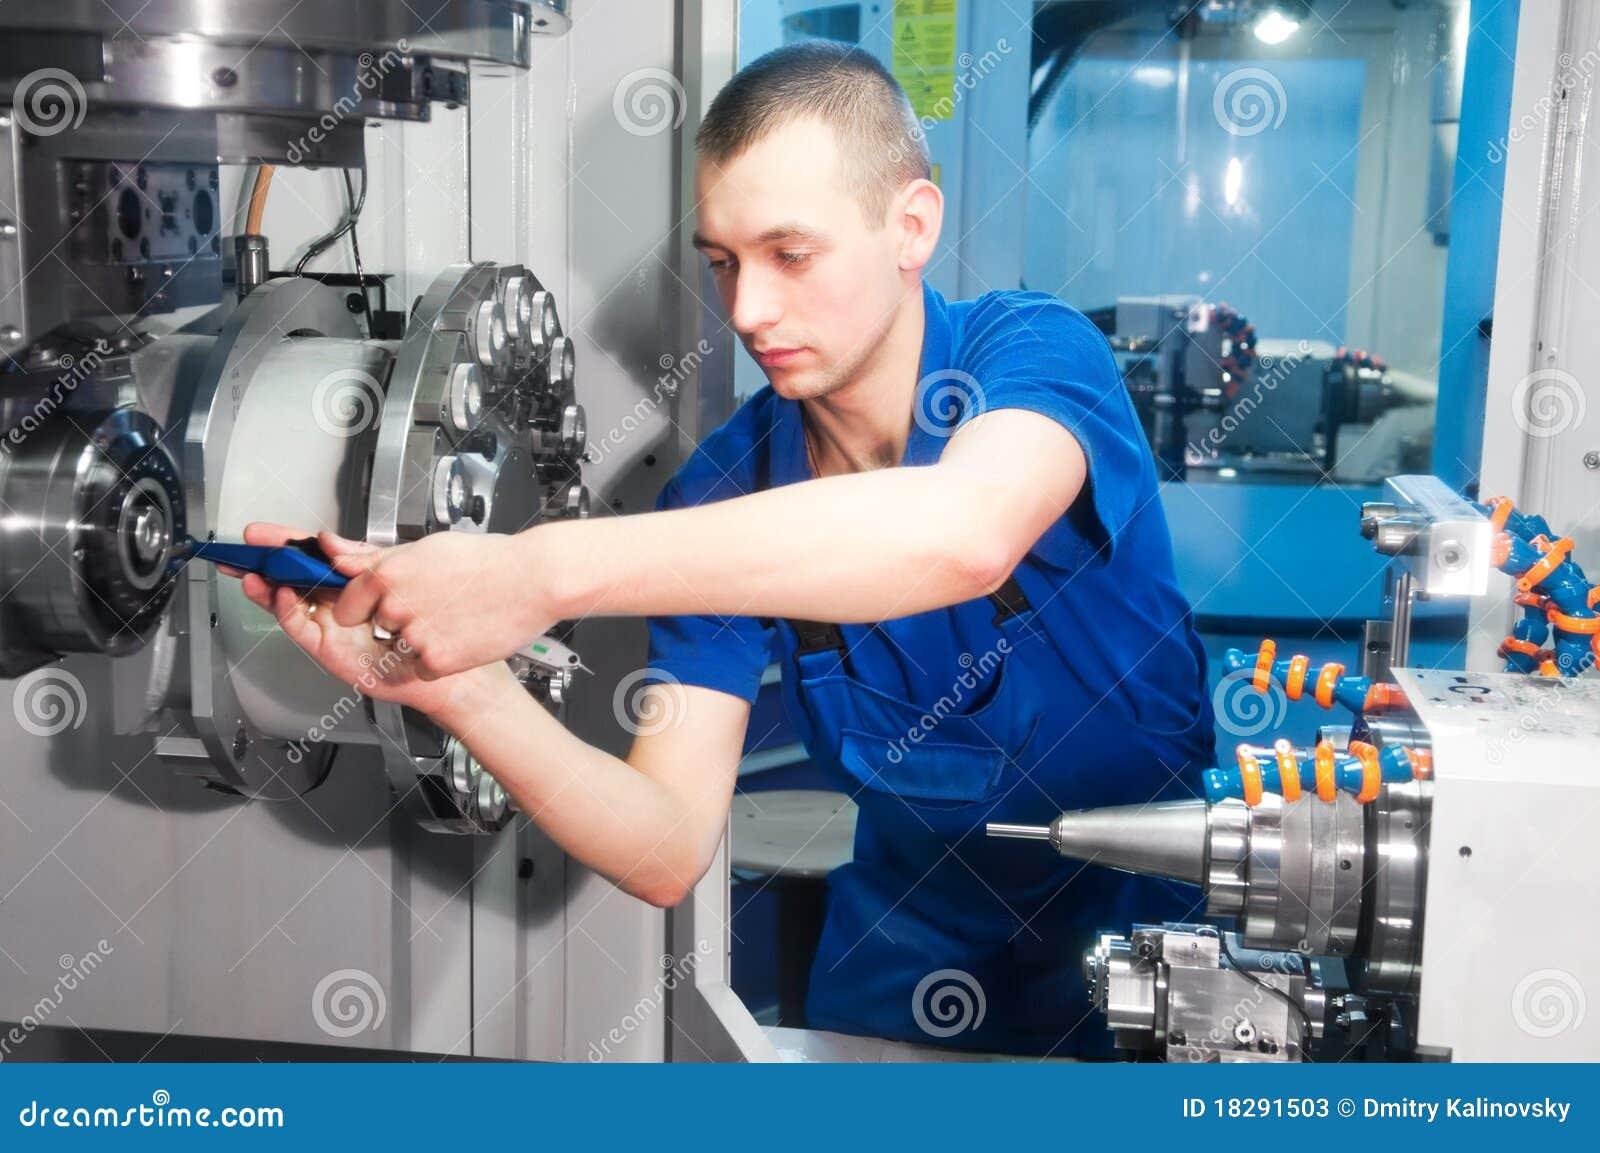 how to operate lathe machine pdf